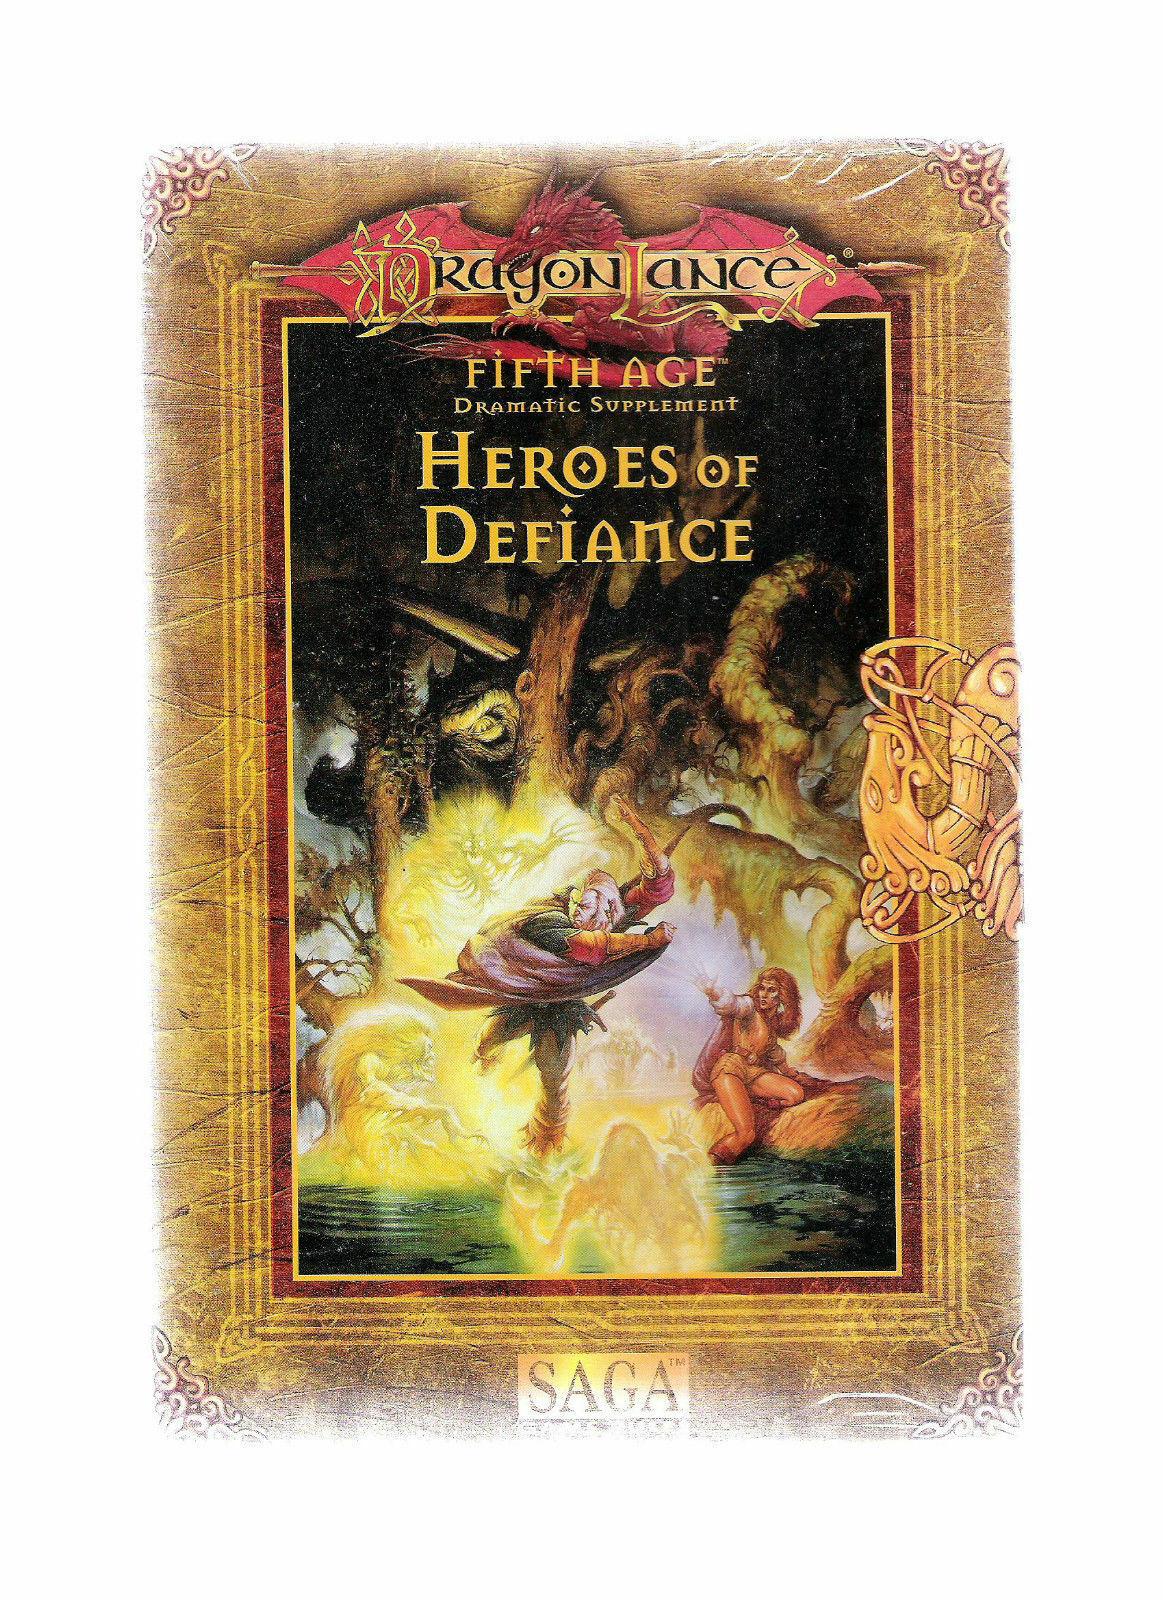 TSR AD&D 2E DRAGONLANCE 5TH AGE HEROES DEFIANCE 9517 ADV DUNGEON DRAGON